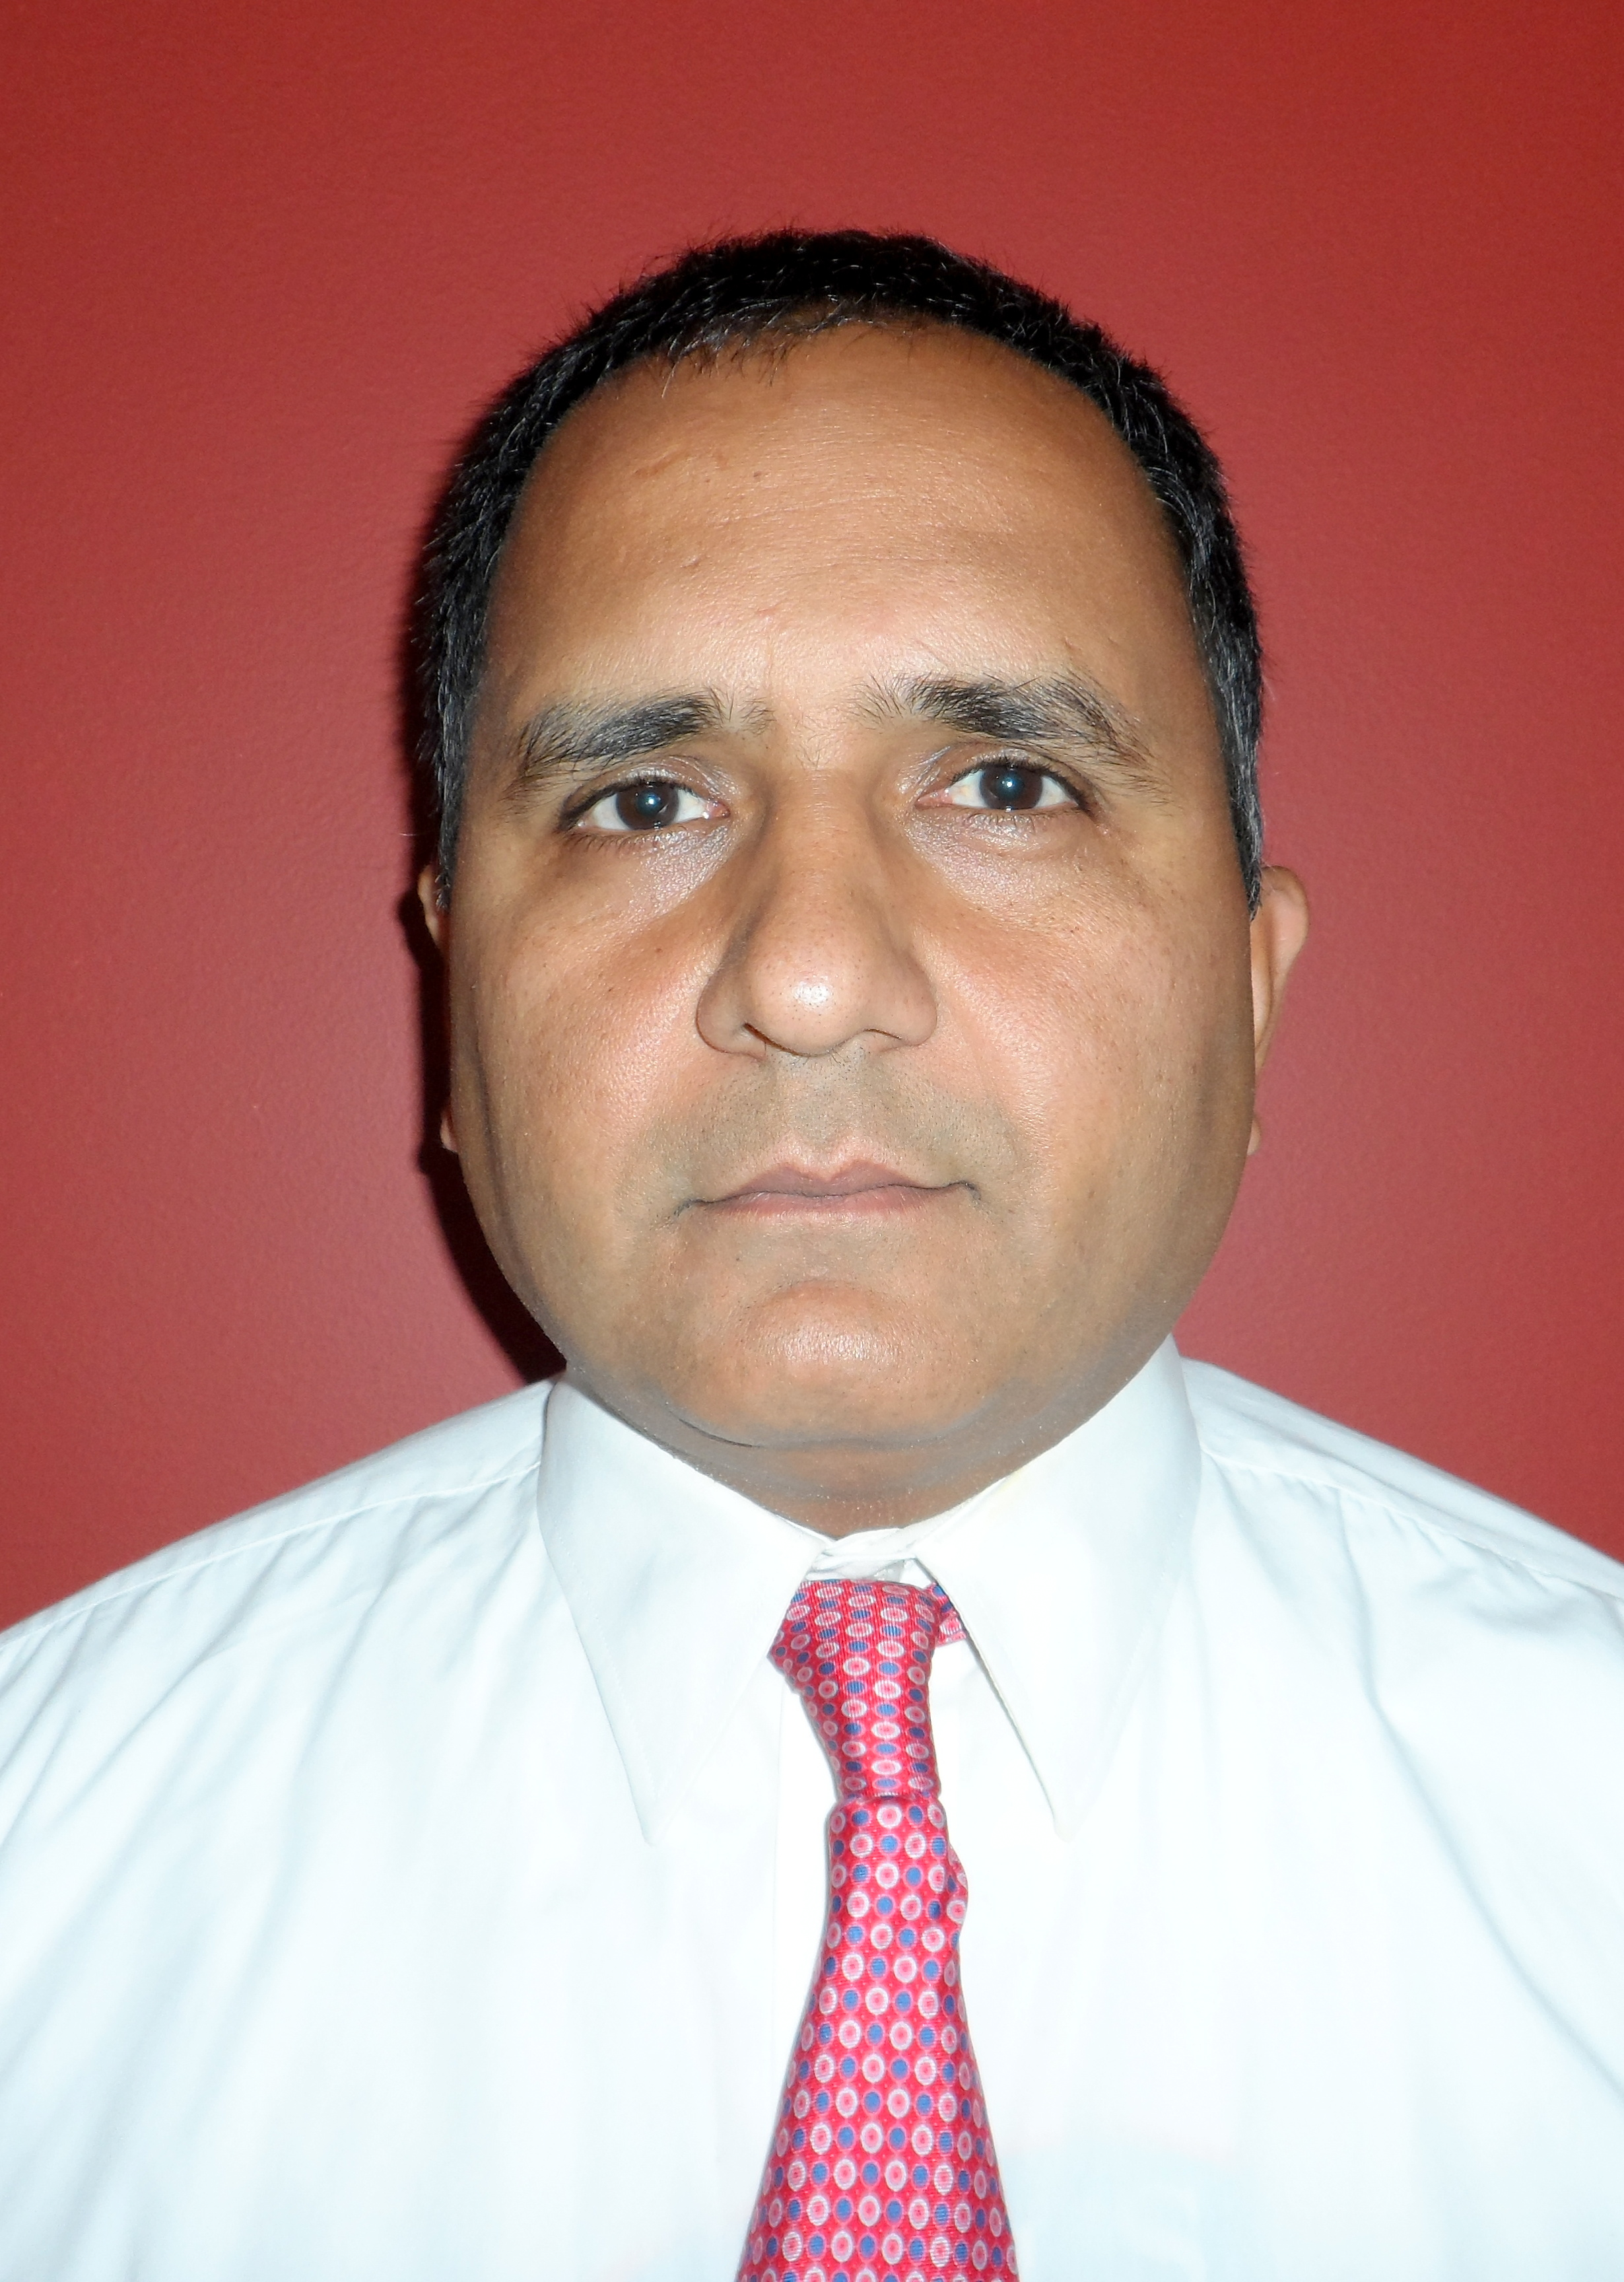 Divyang Patel